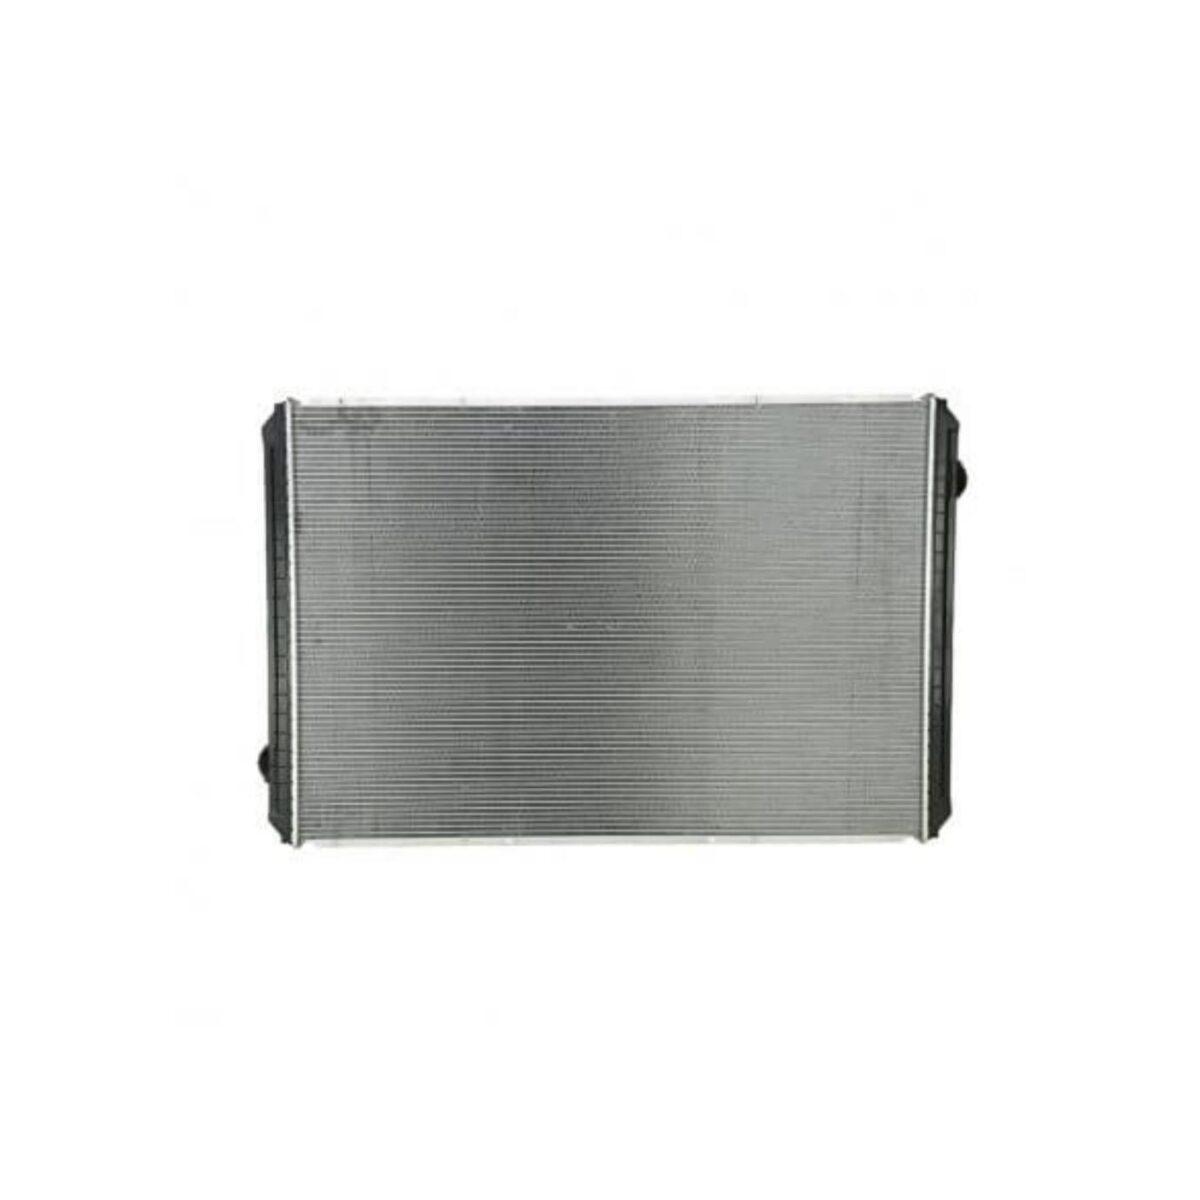 hino 145165185 05 07 radiator oem 16400e0220 3